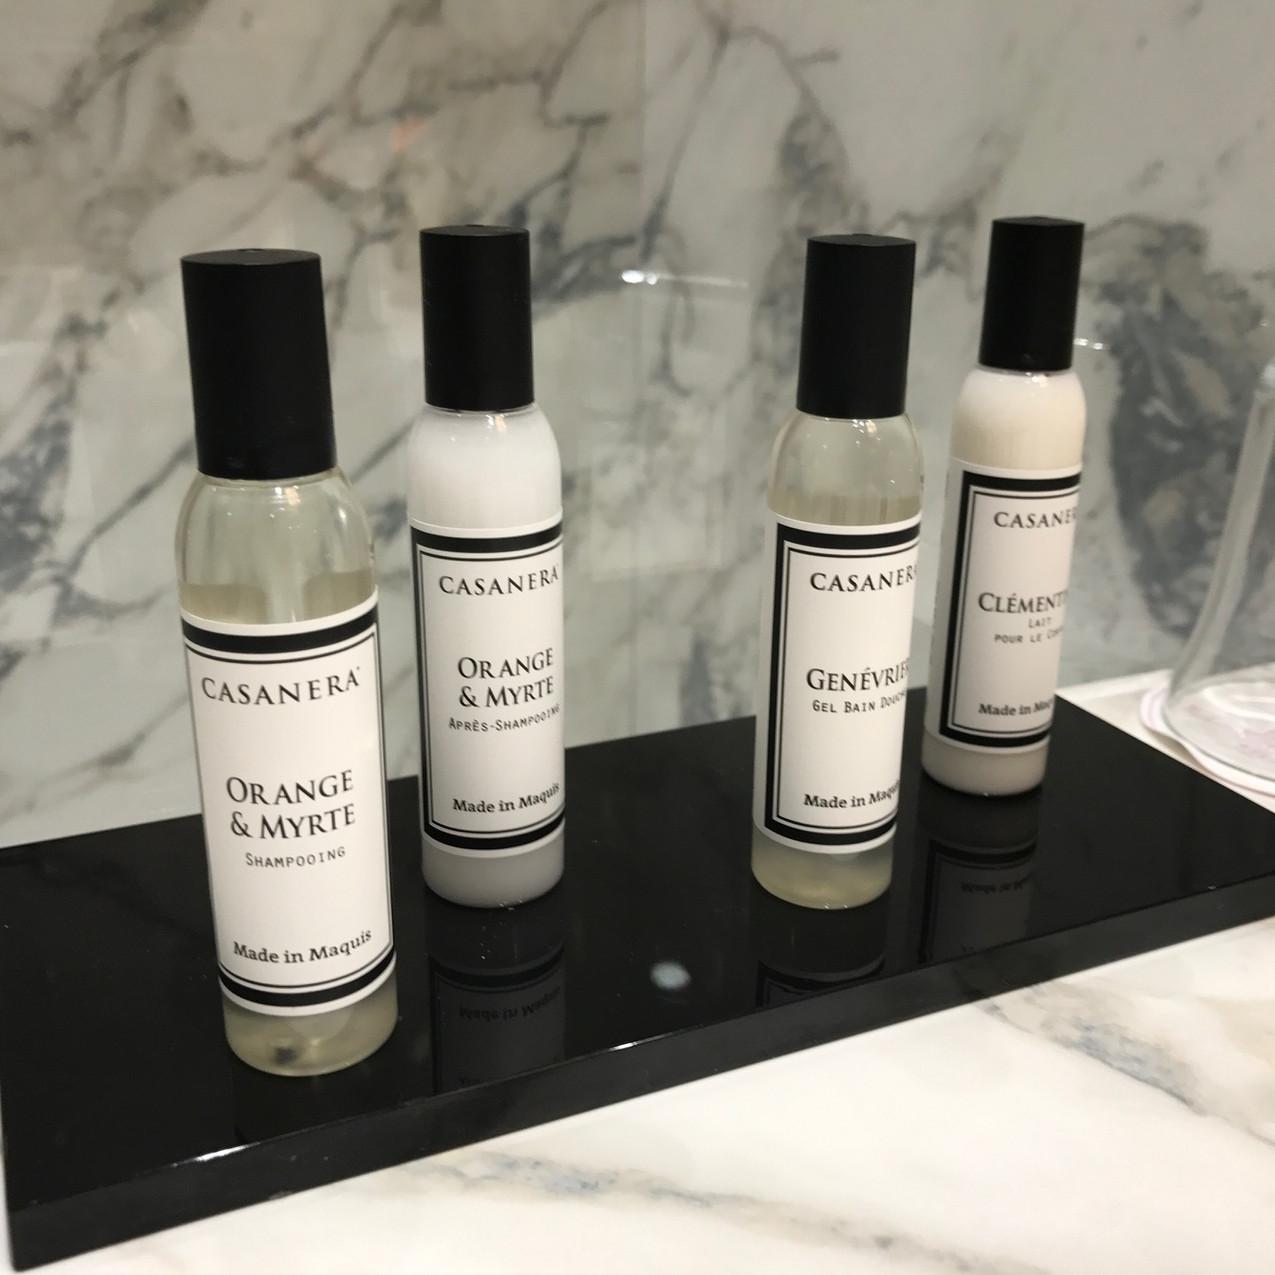 Casanera bath products